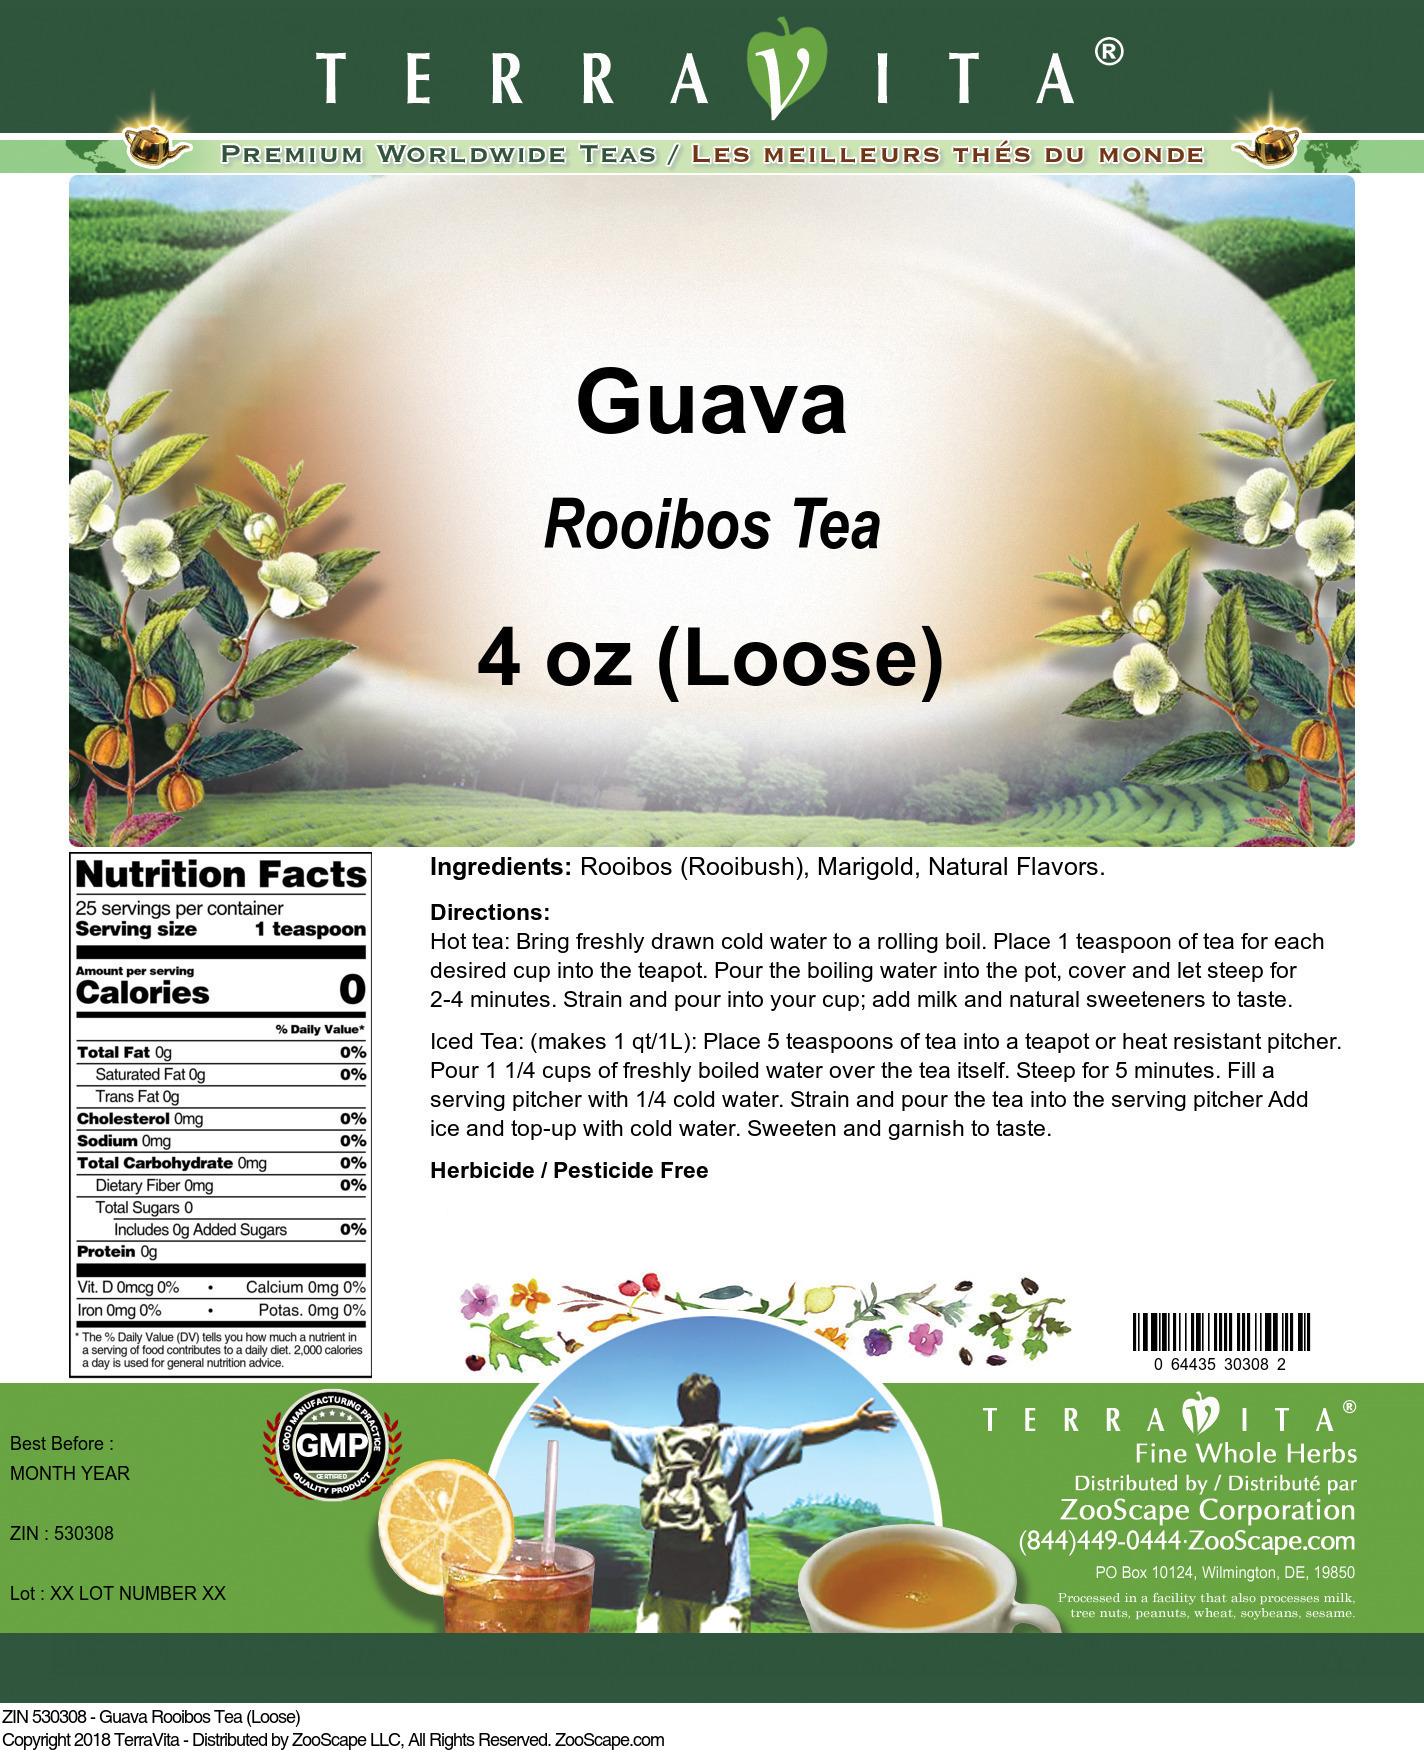 Guava Rooibos Tea (Loose)